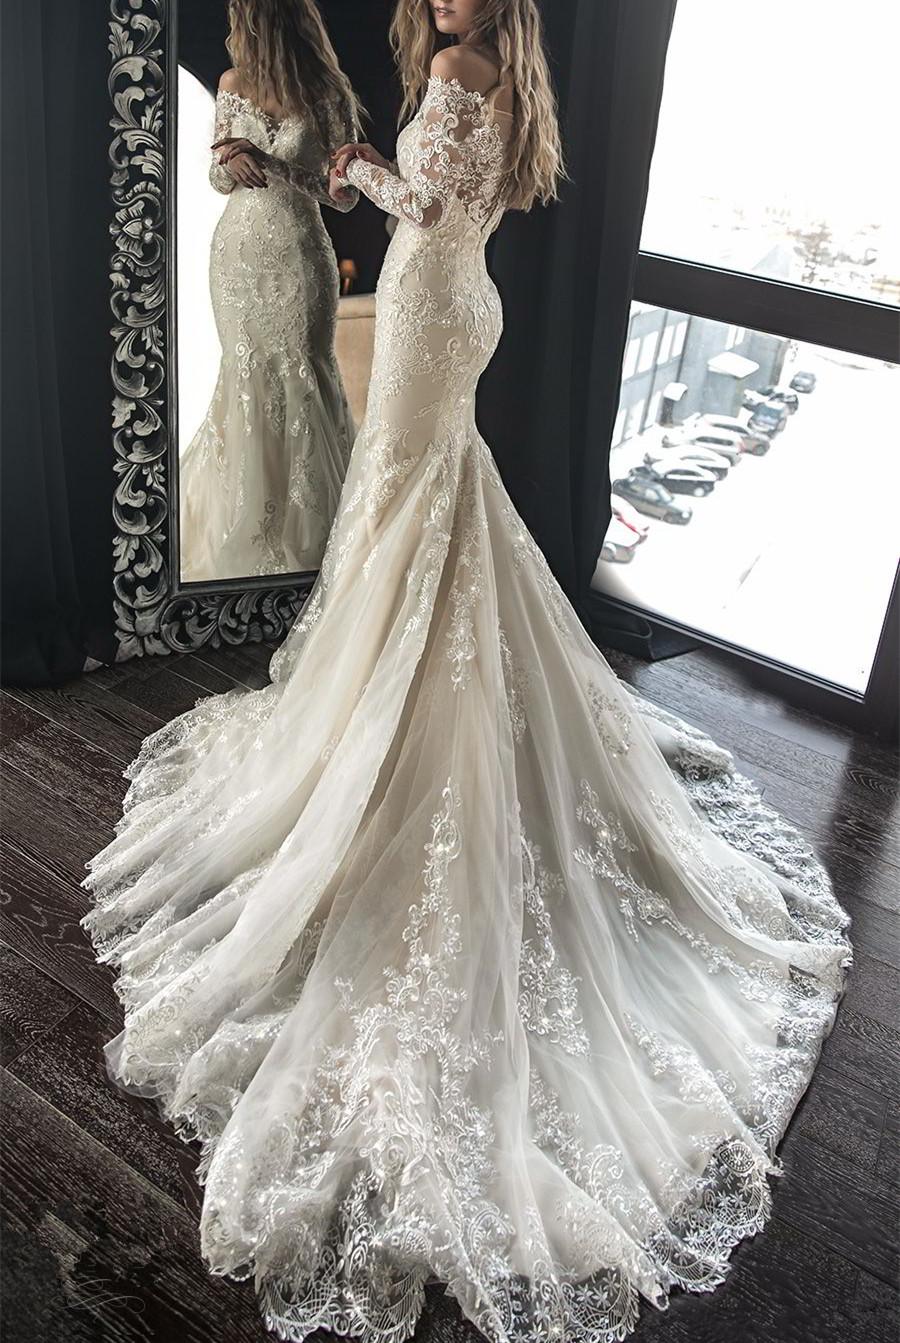 Vintage Mermaid Lace Wedding Dress Off Shoulder Long Sleeves Bridal Dress Sweep Train Wedding Gown Bridal Dresses Lace Long Sleeve Bridal Dresses Long Wedding Dresses [ 1343 x 900 Pixel ]